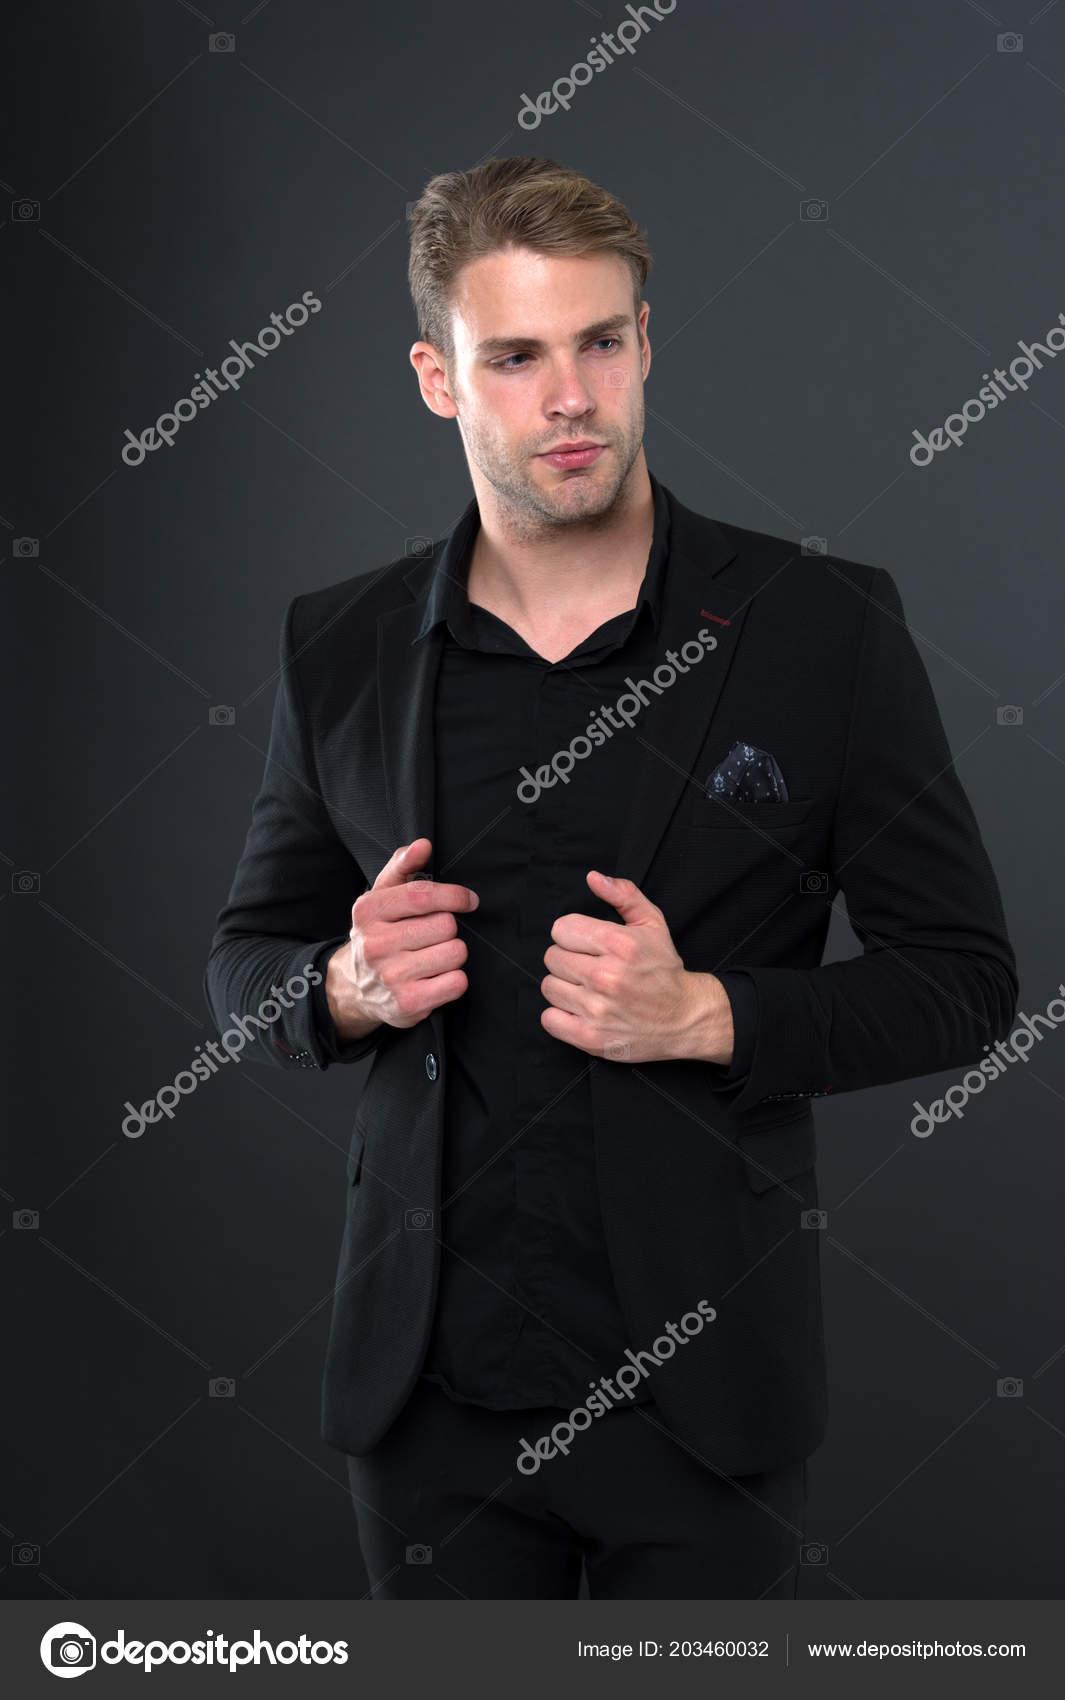 Fondo oscuro de hombre bien arreglado elegante traje formal negro pañuelo  bolsillo. ab837b766151